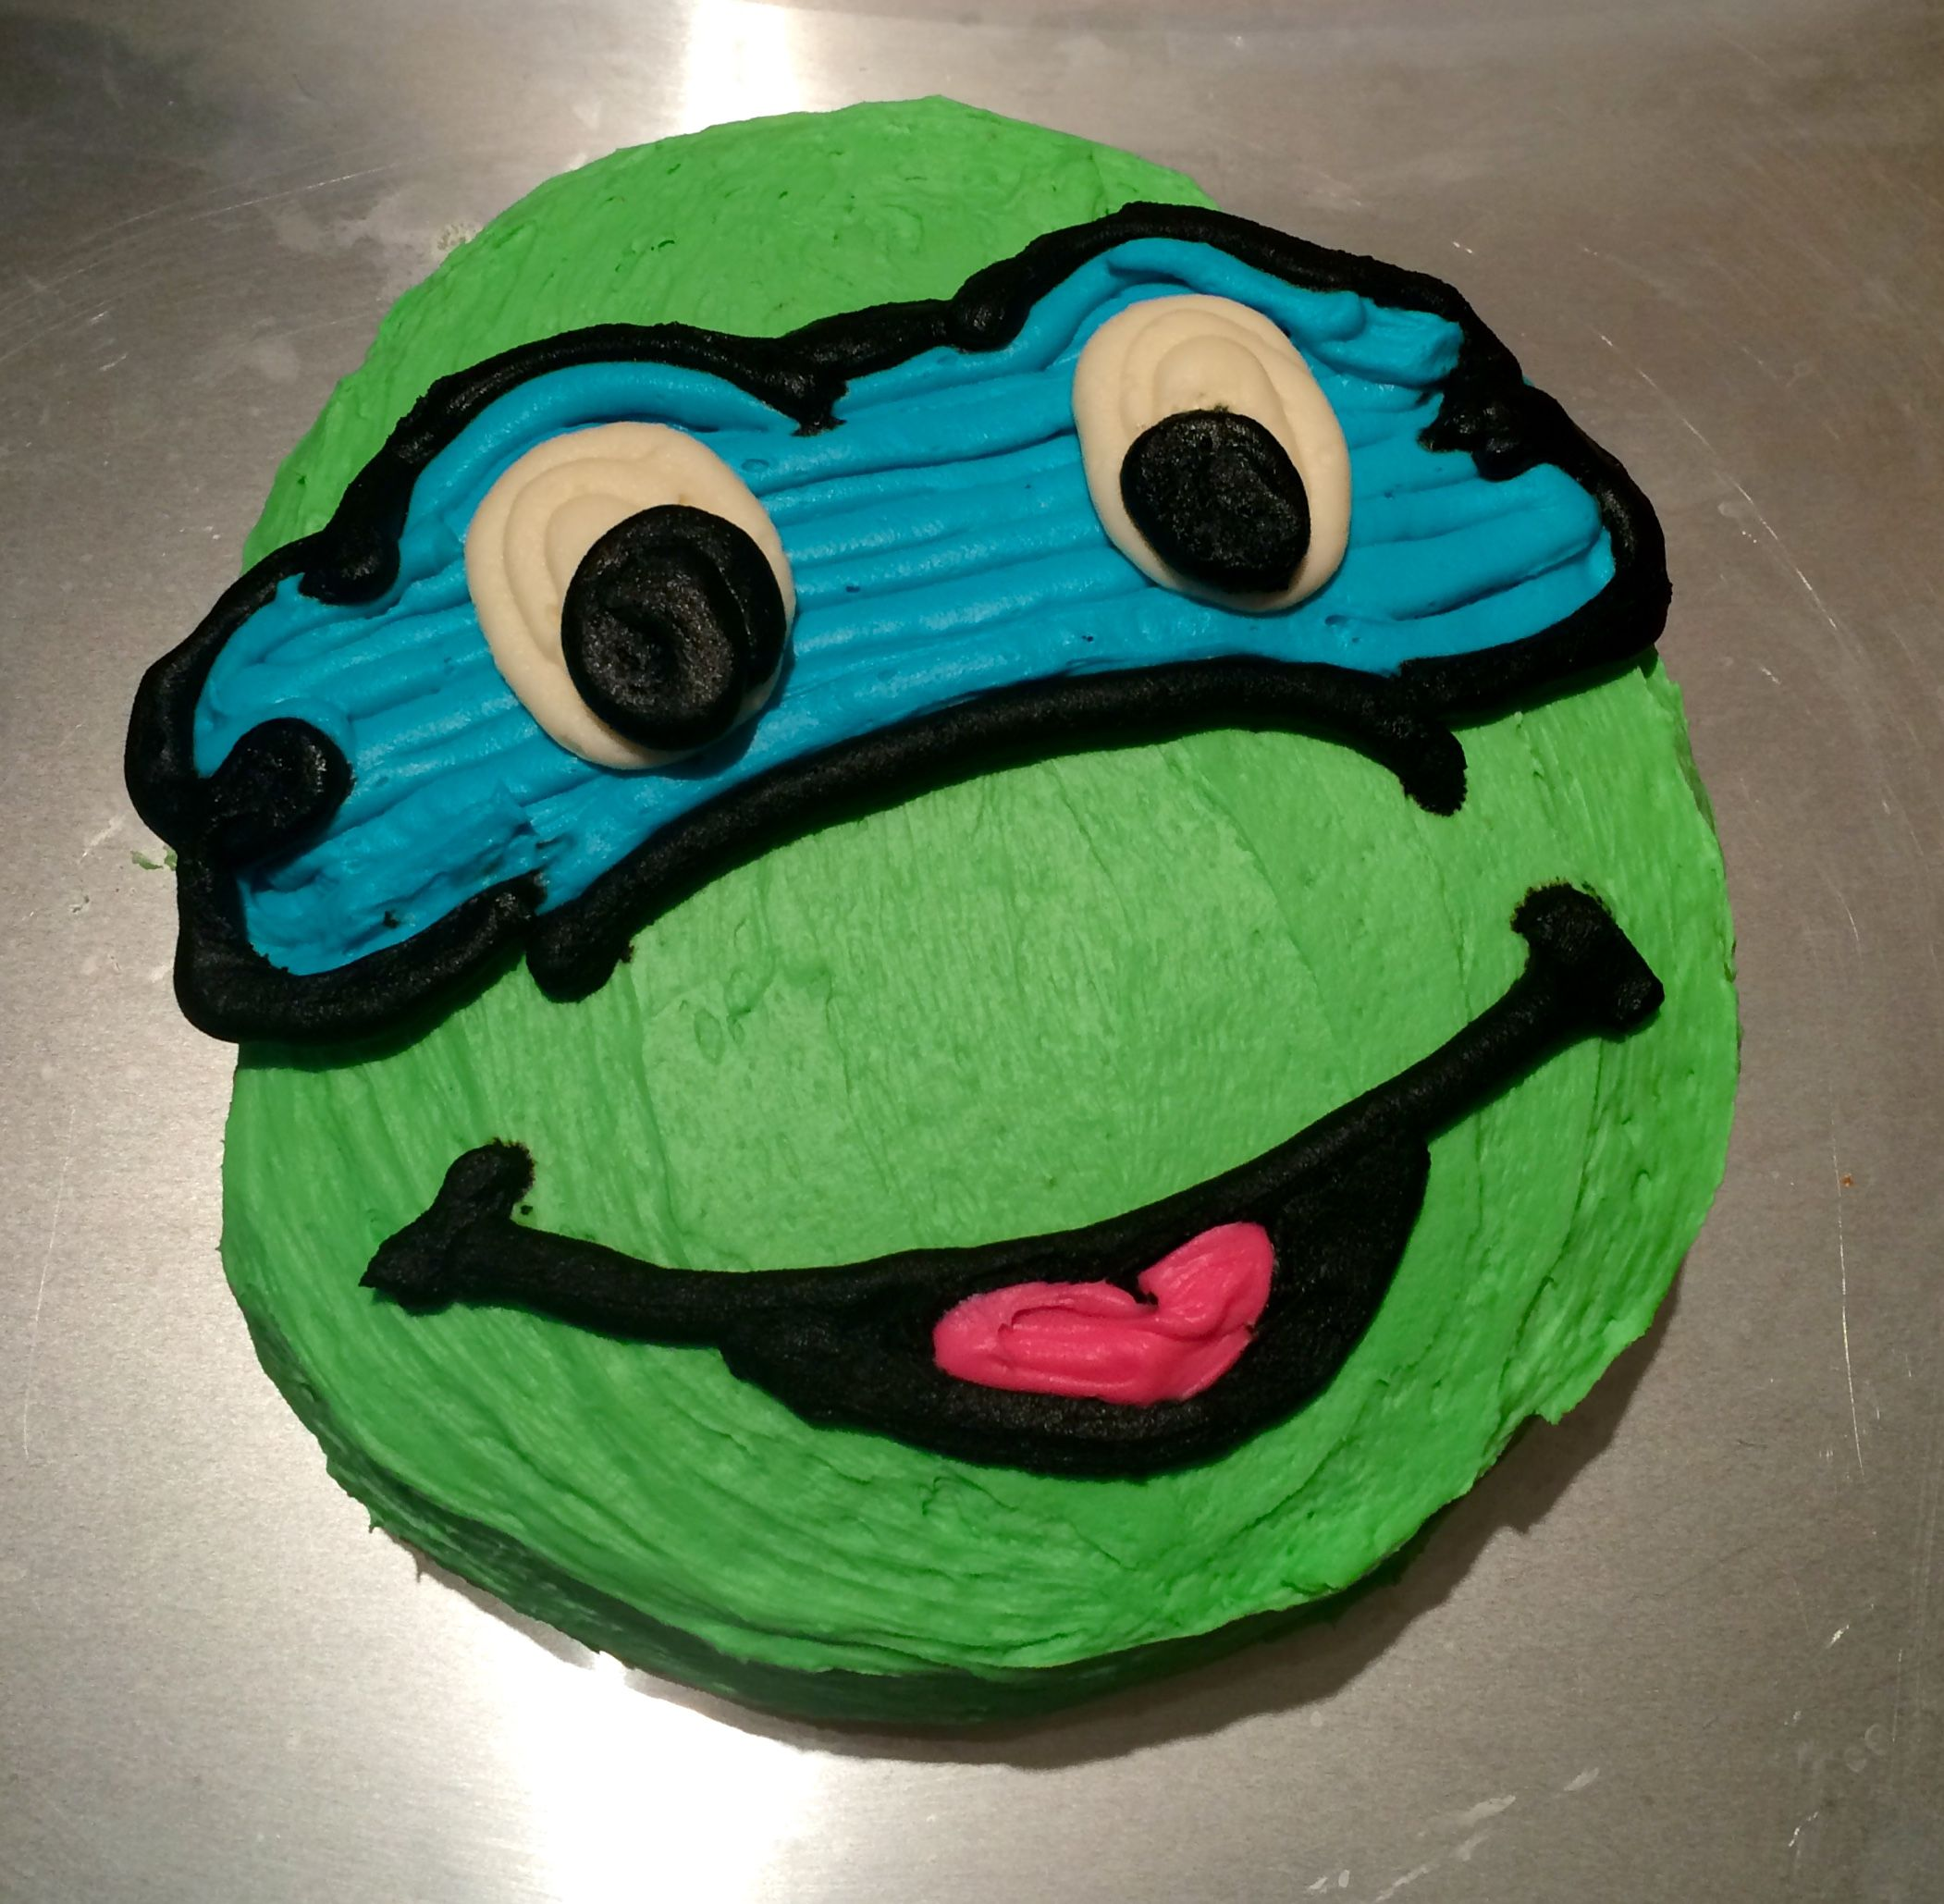 Diy Cake Homemade Cake Ninja Turtle Cake Leonardo Cake Boy